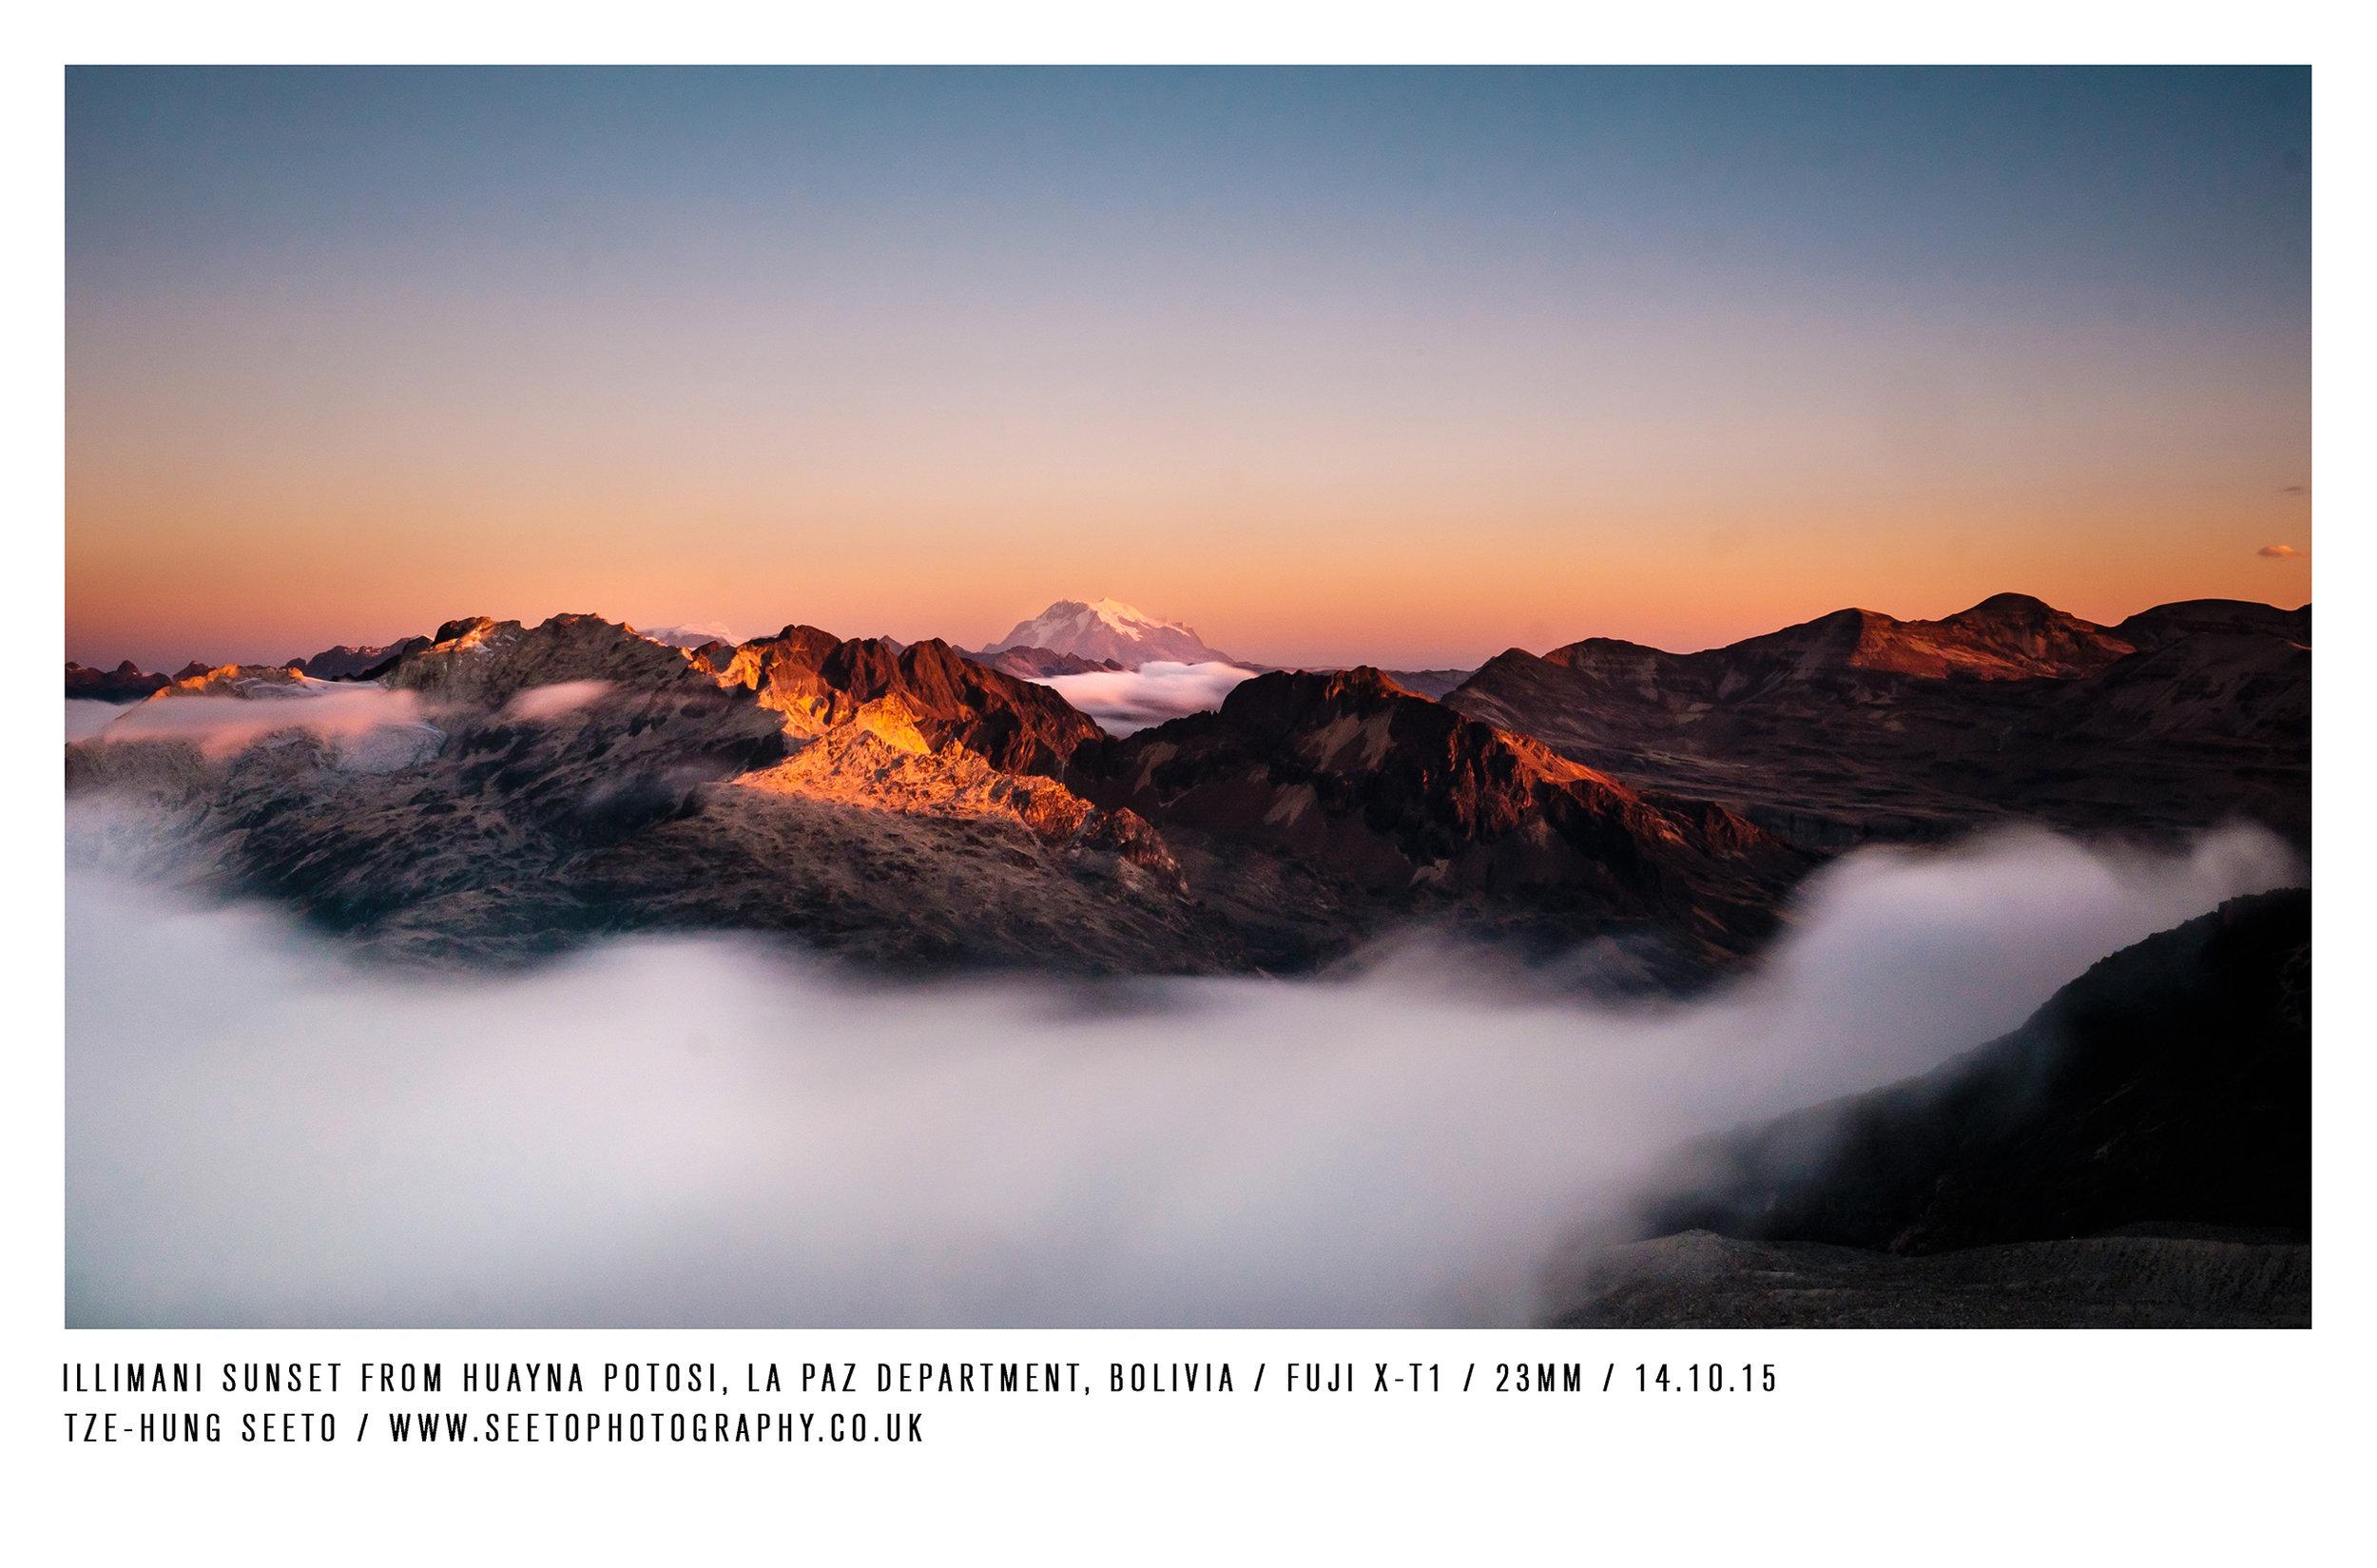 Illimani sunset from Huayna Potosi_CP.jpg